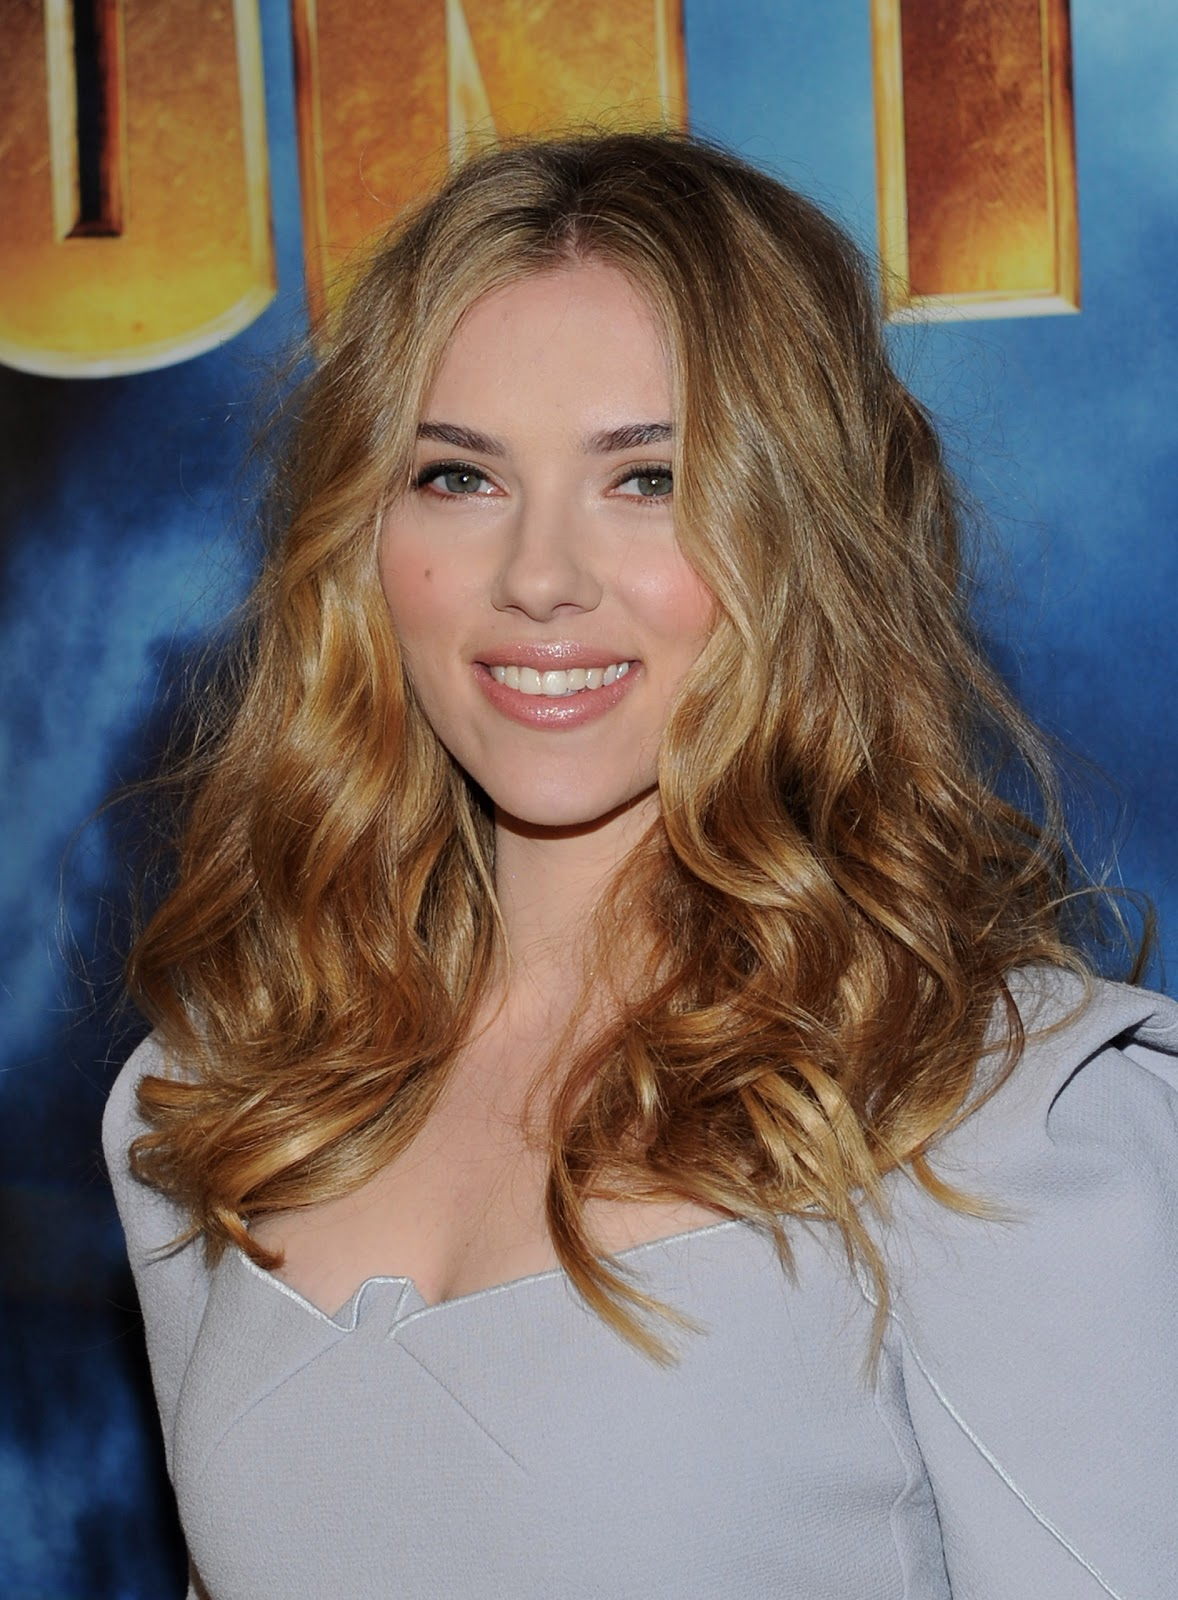 49. Scarlett Johansson 49. Scarlett Johansson new picture